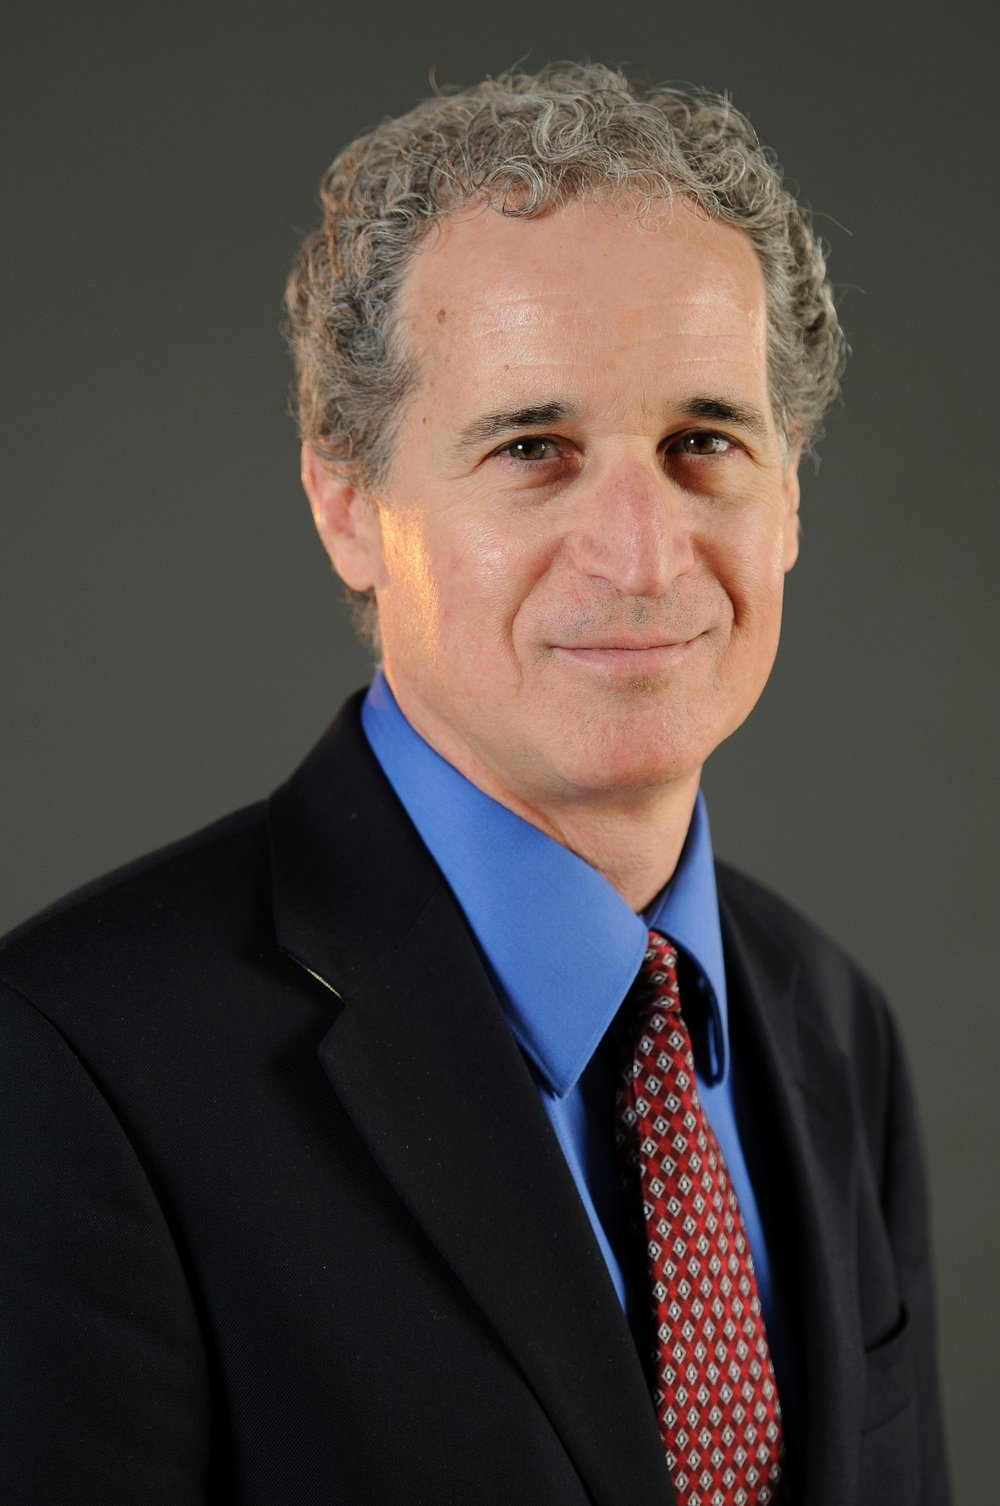 Brian Mittman (Kaiser Permanente, USA)